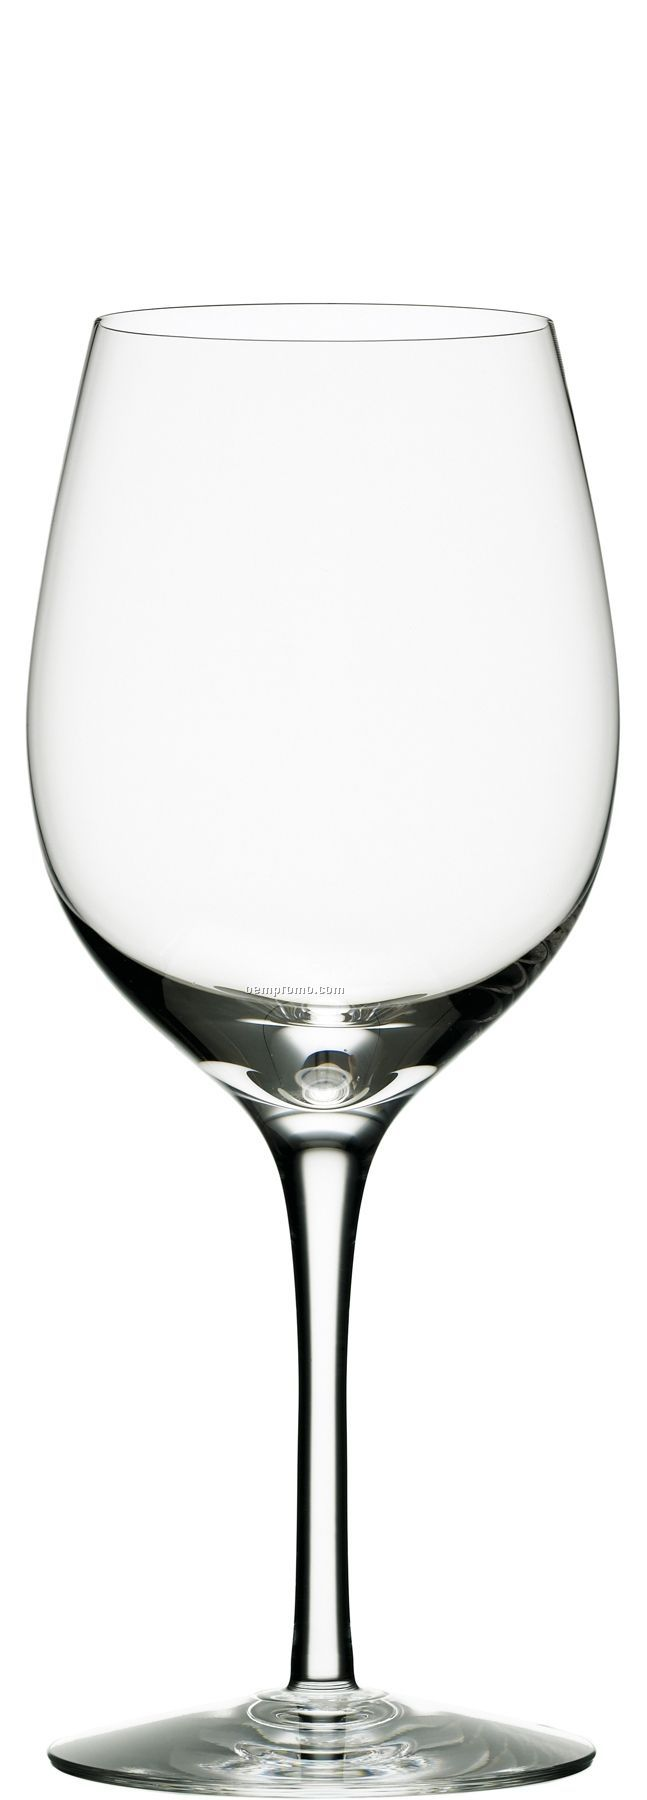 Merlot Crystal 14 3/4 Oz. Wine Glass By Erika Lagerbielke